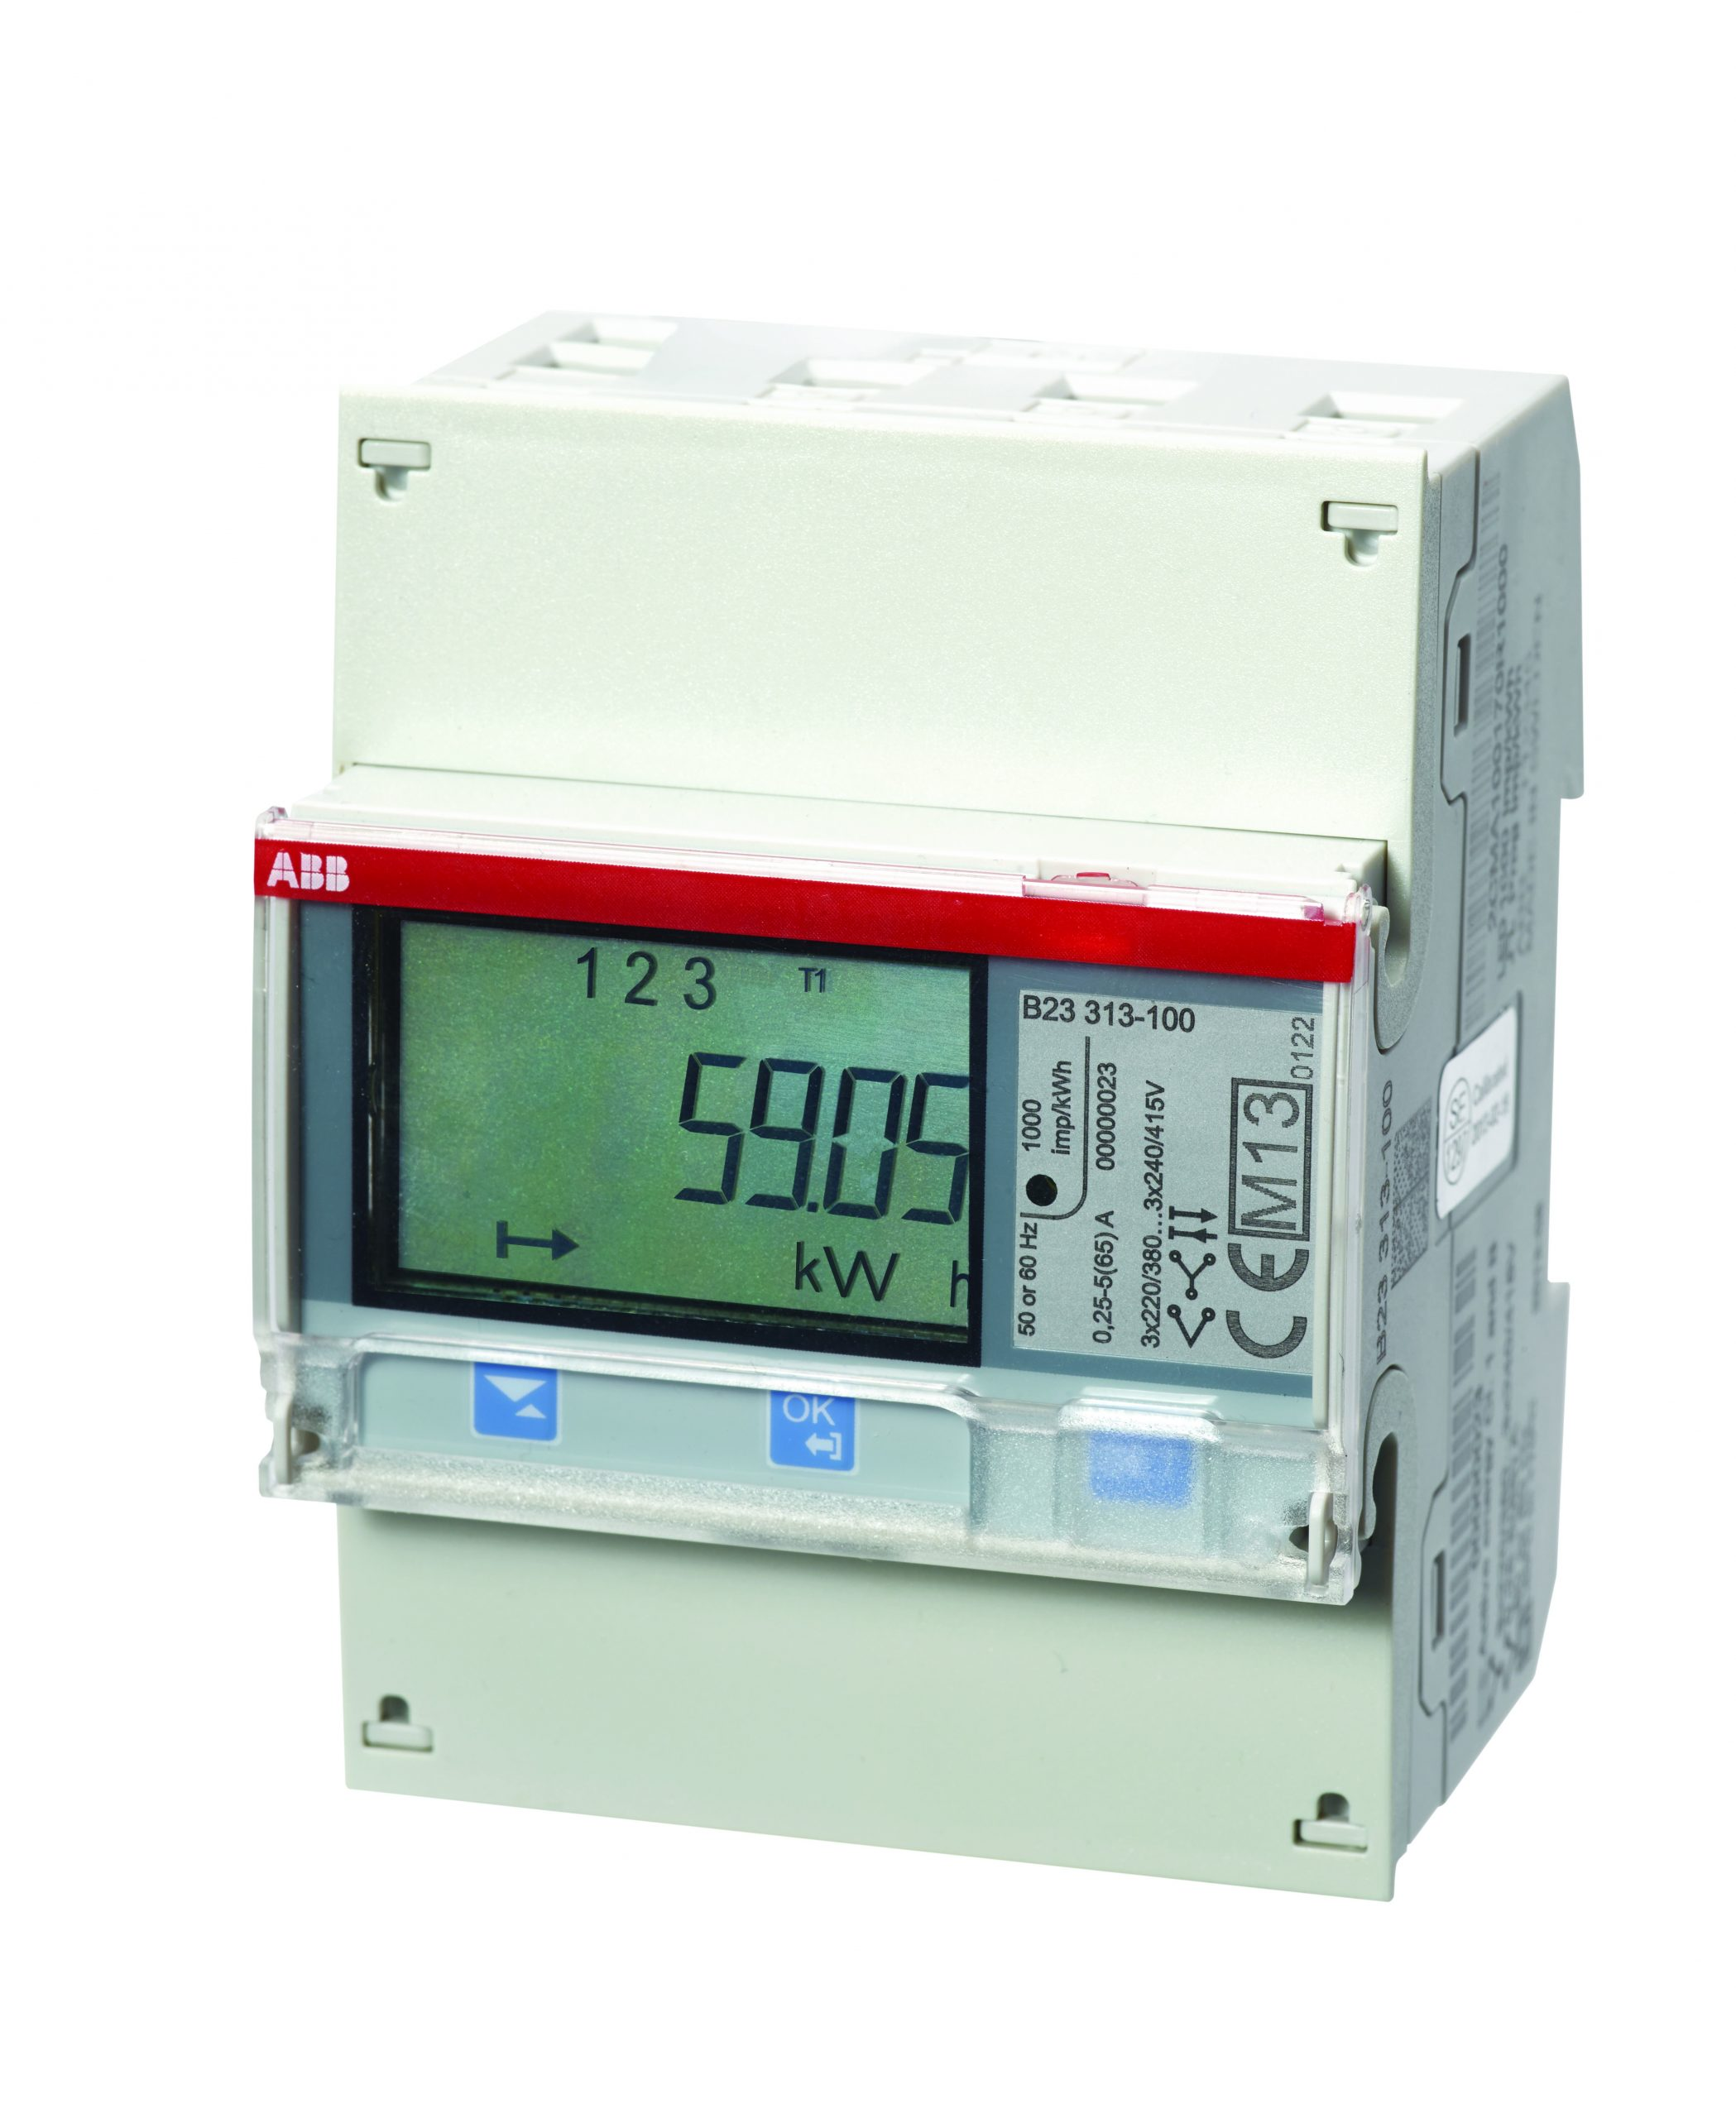 Elektrozähler ABB Stromzähler B23 - ICM Technologies GmbH